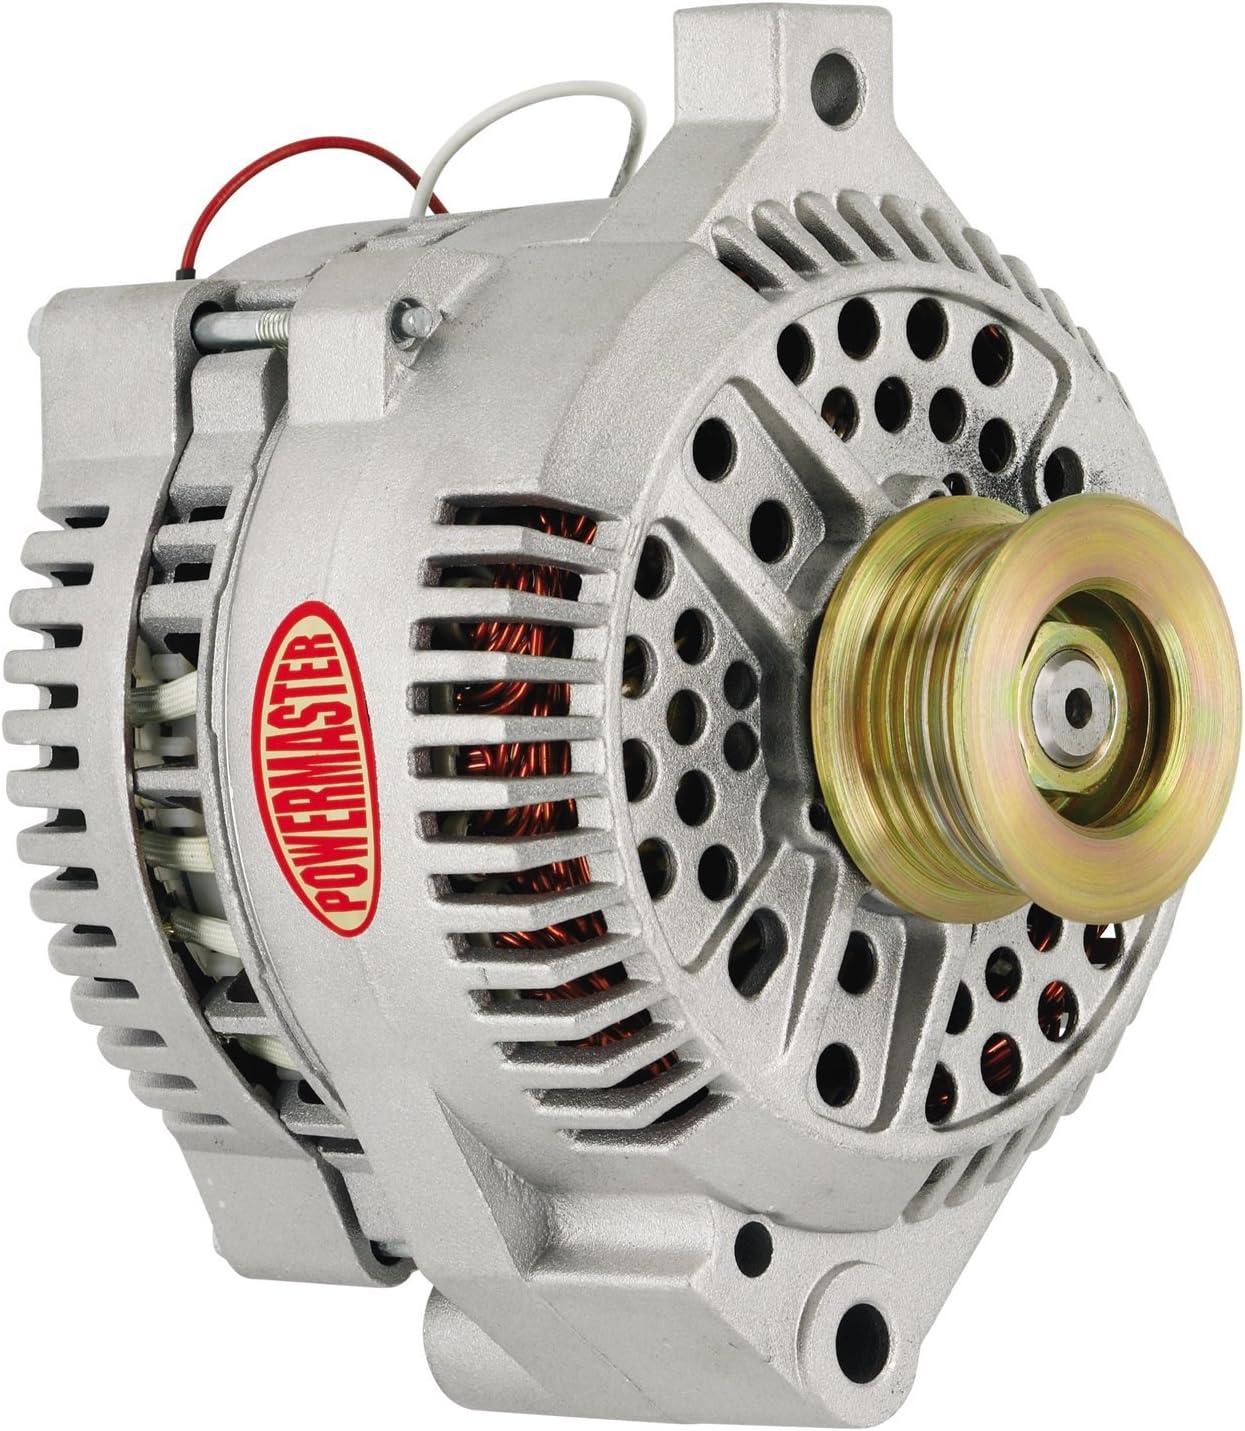 [ZHKZ_3066]  Amazon.com: Powermaster 477711 Natural Ford 3G One Wire Alternator 200A:  Automotive | Ford Powermaster Alternators Wiring |  | Amazon.com